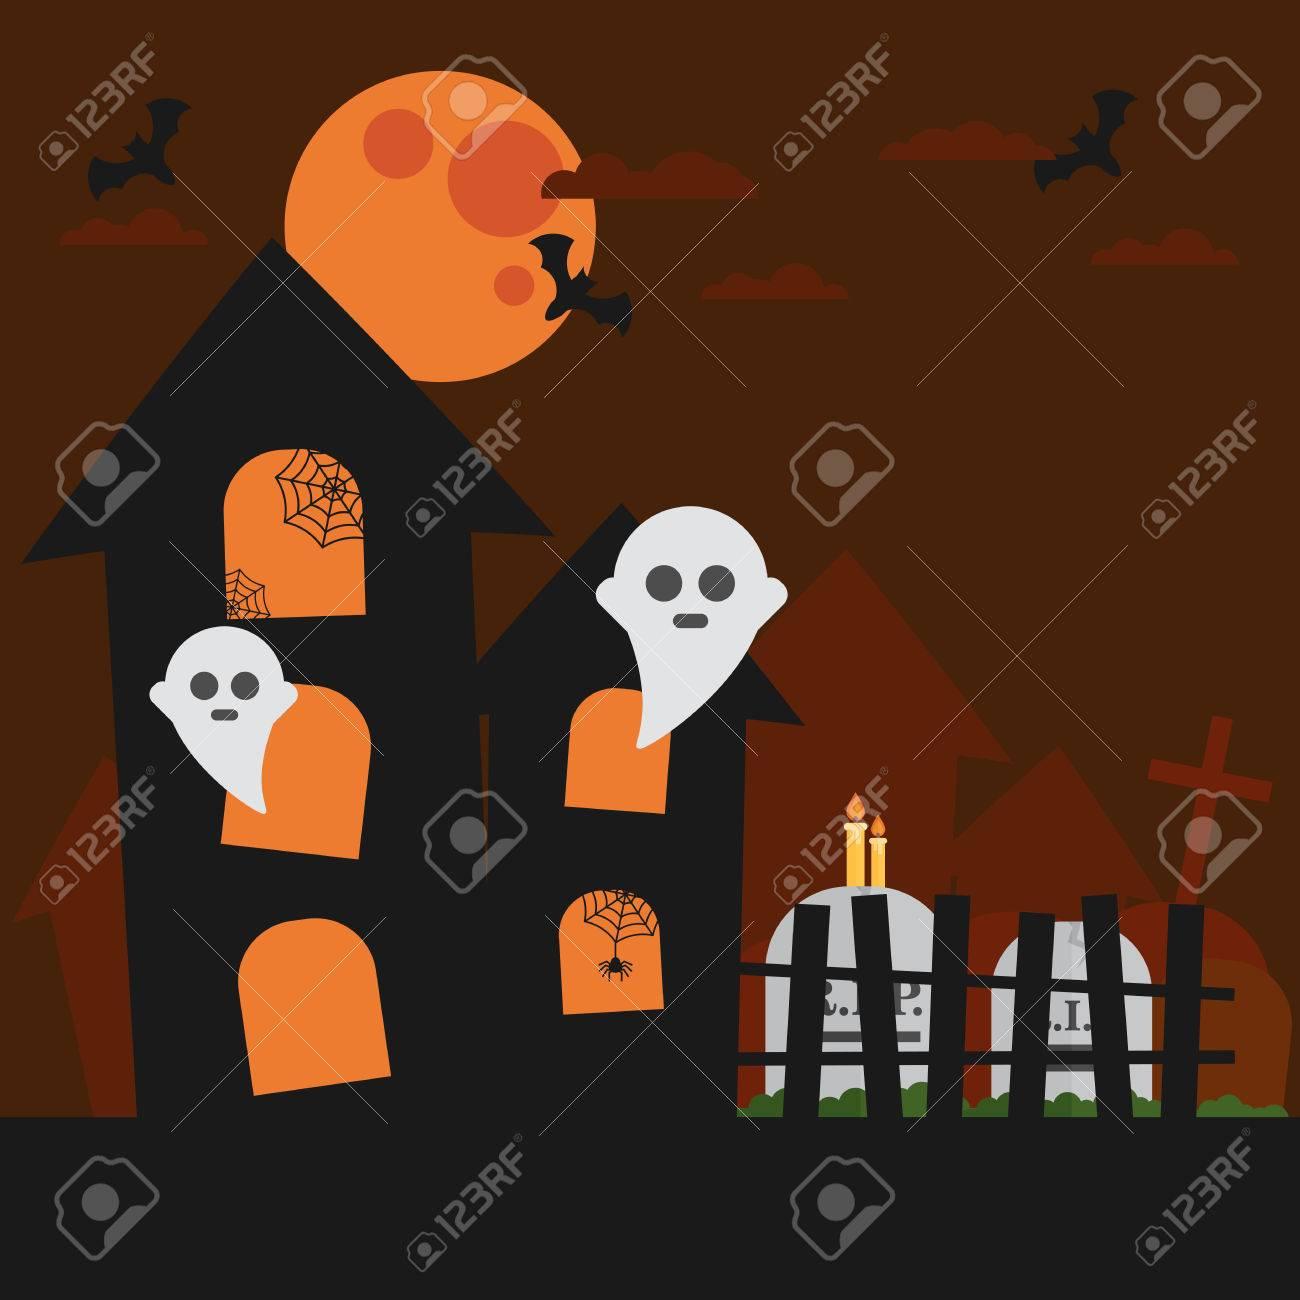 Haunted House Bat Ghost Cloud In The Sky Halloween Card Orange